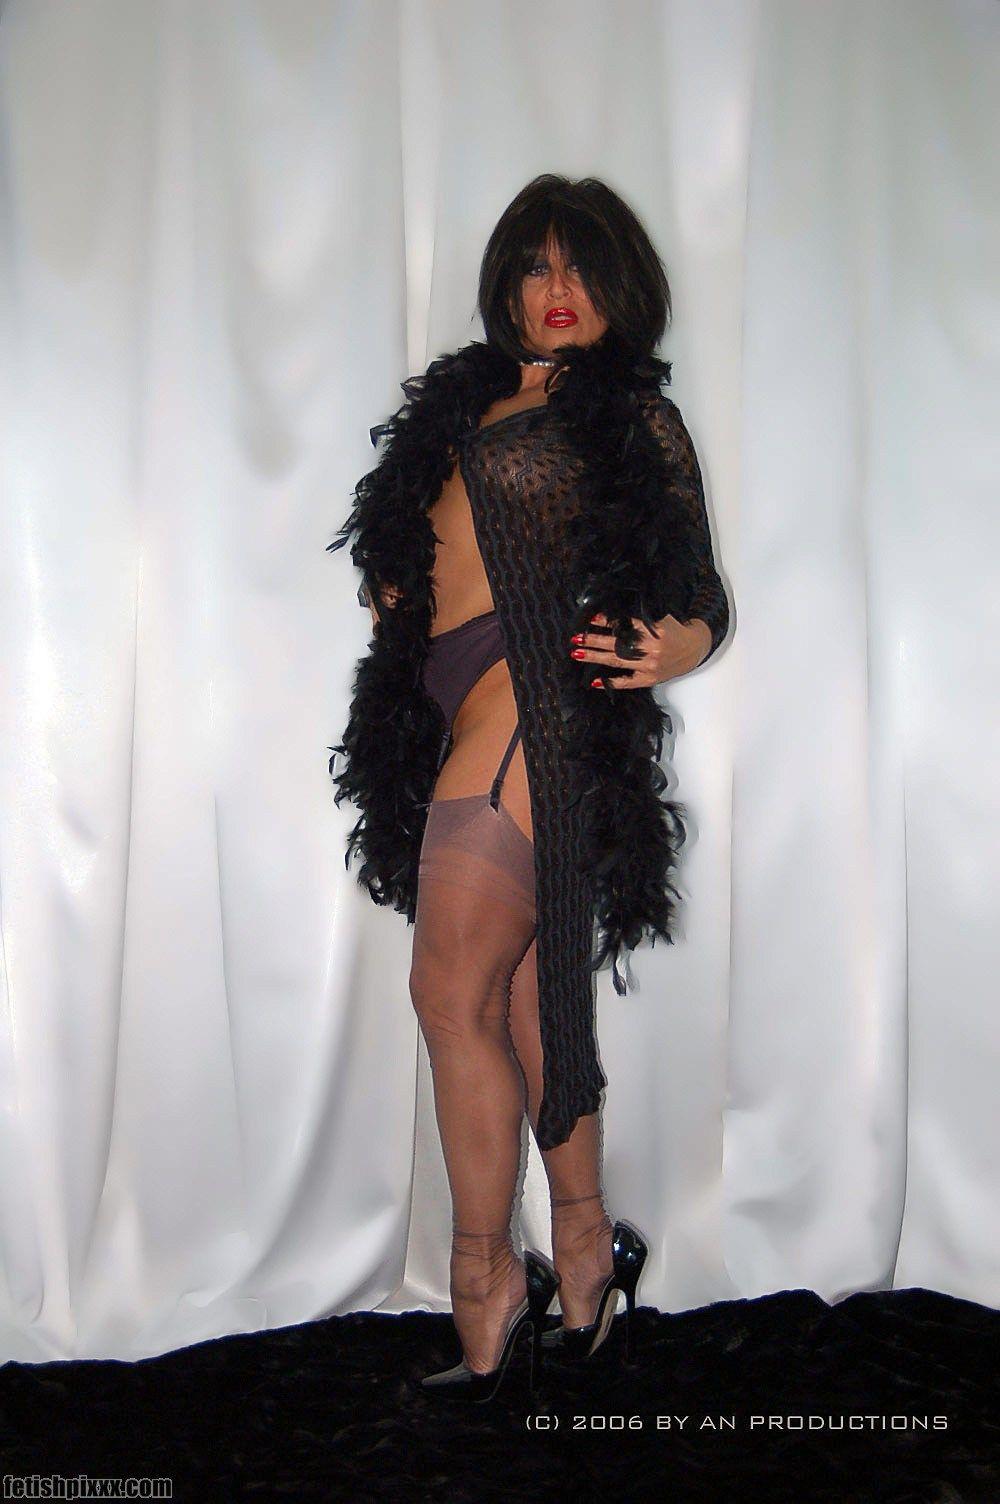 Amanda Posing In Grey Ff Nylon Stockings And High Heels